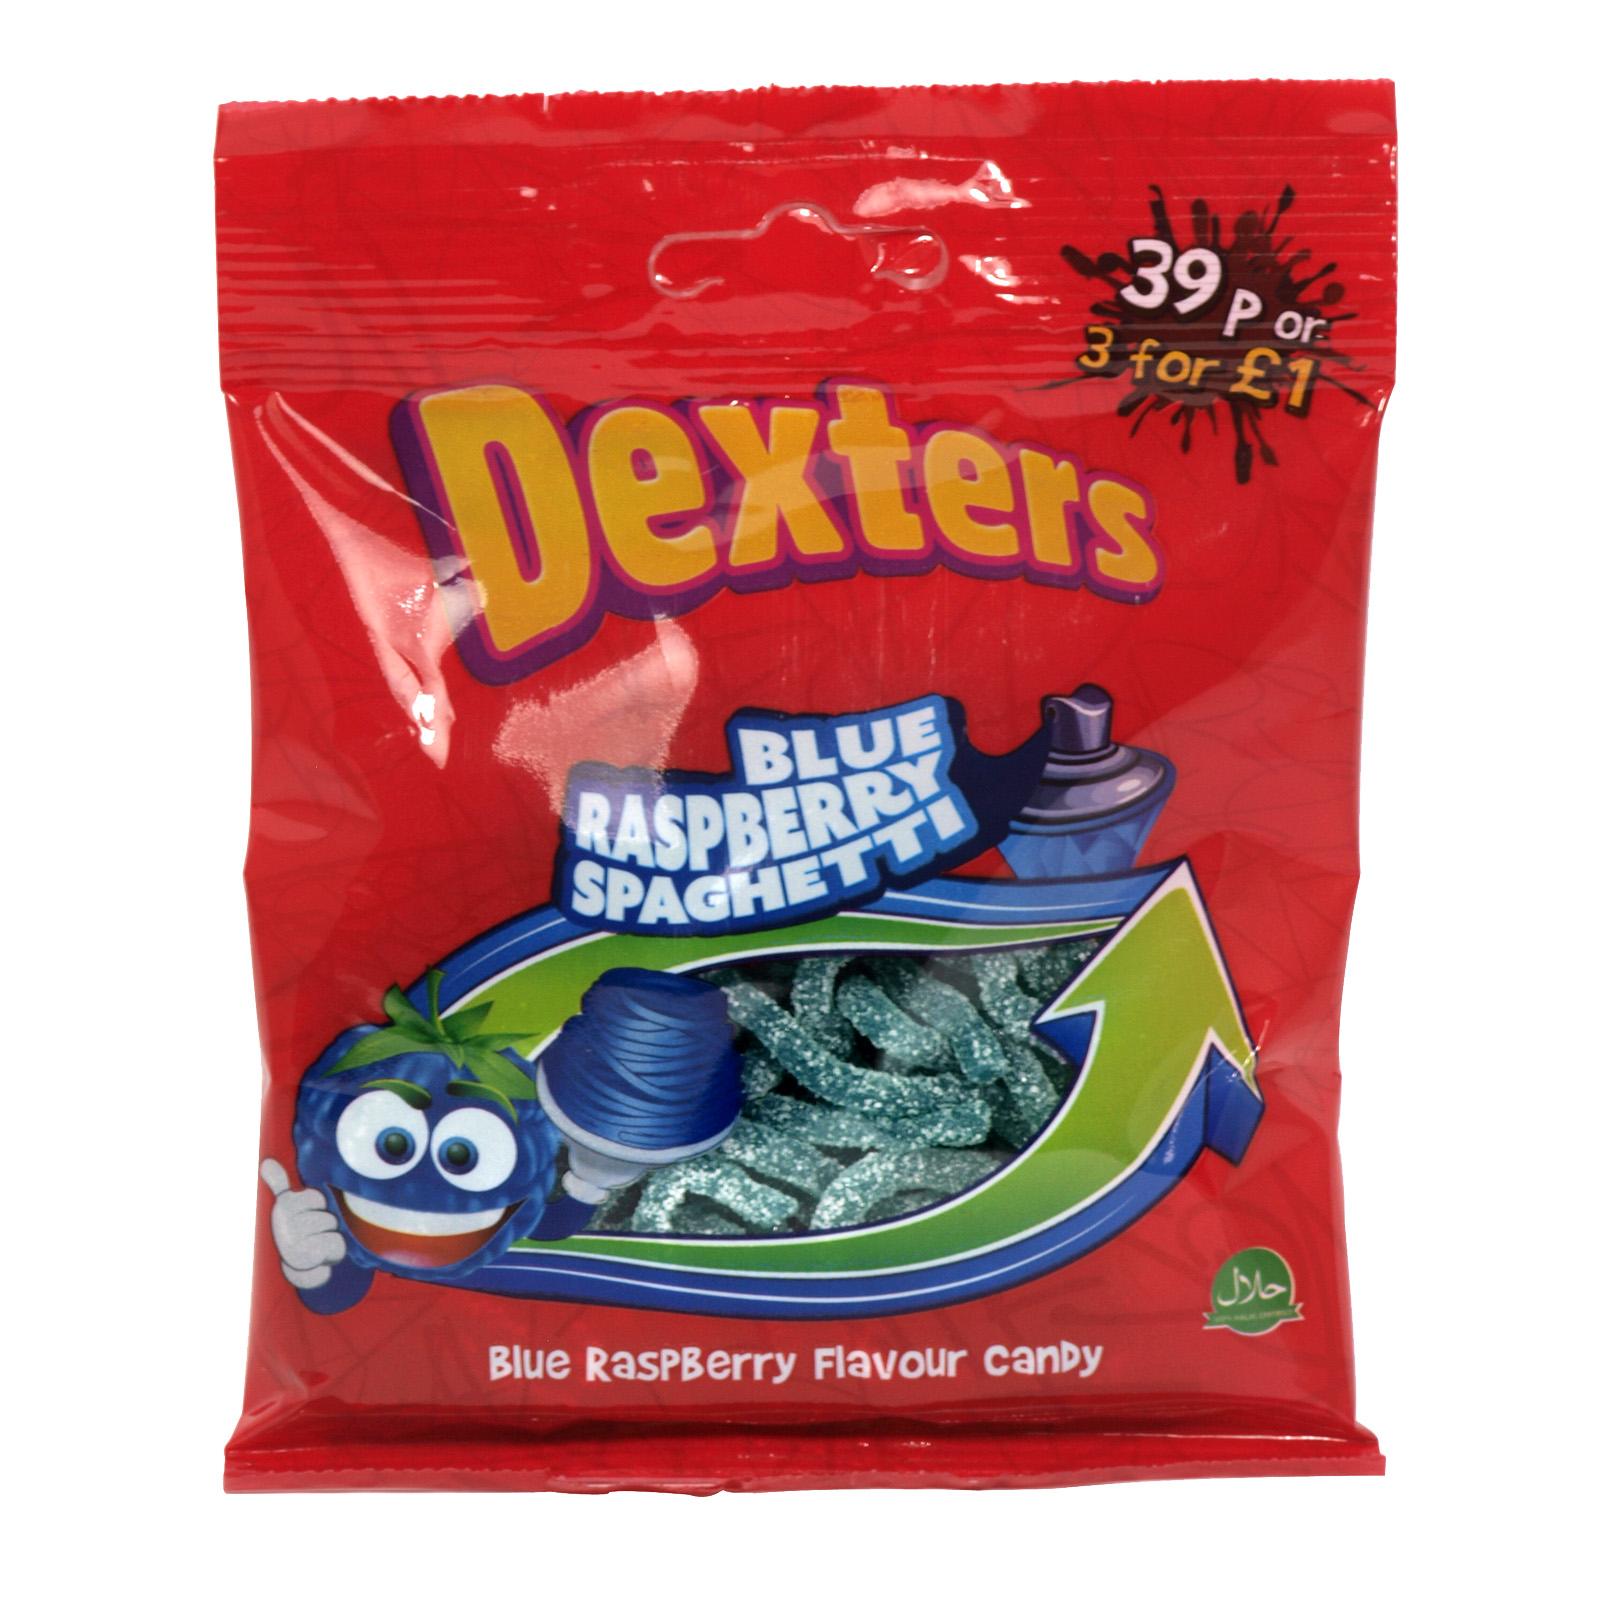 DEXTERS BLUE RASPBERRY SPAGHETTI X12